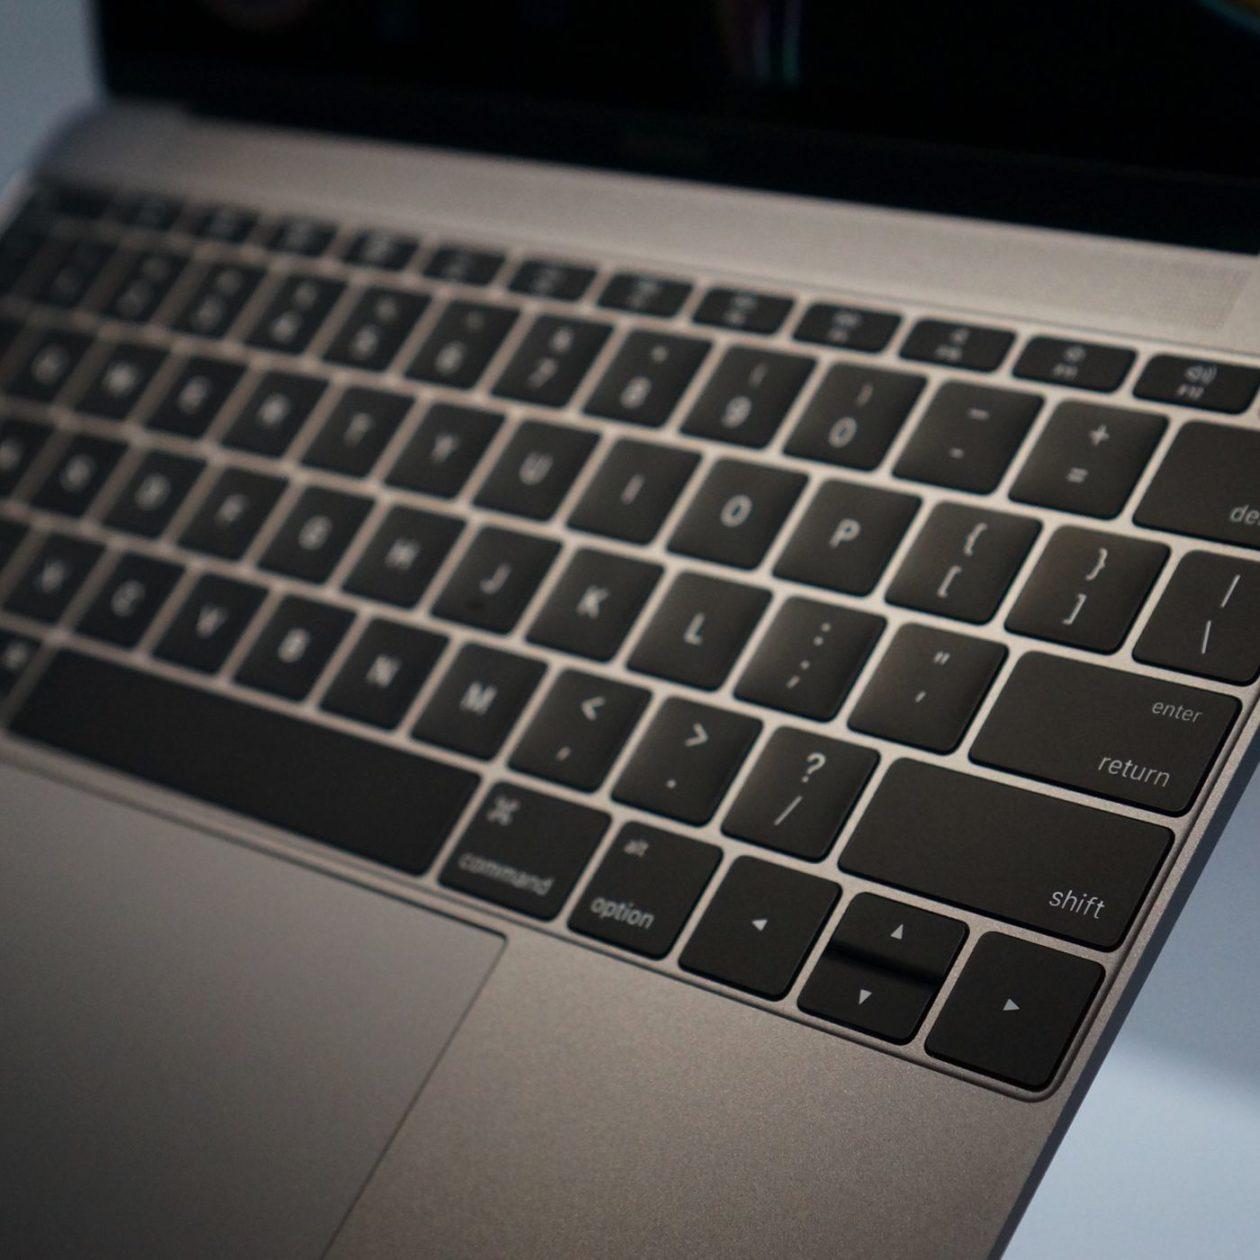 Teclado borboleta do MacBook